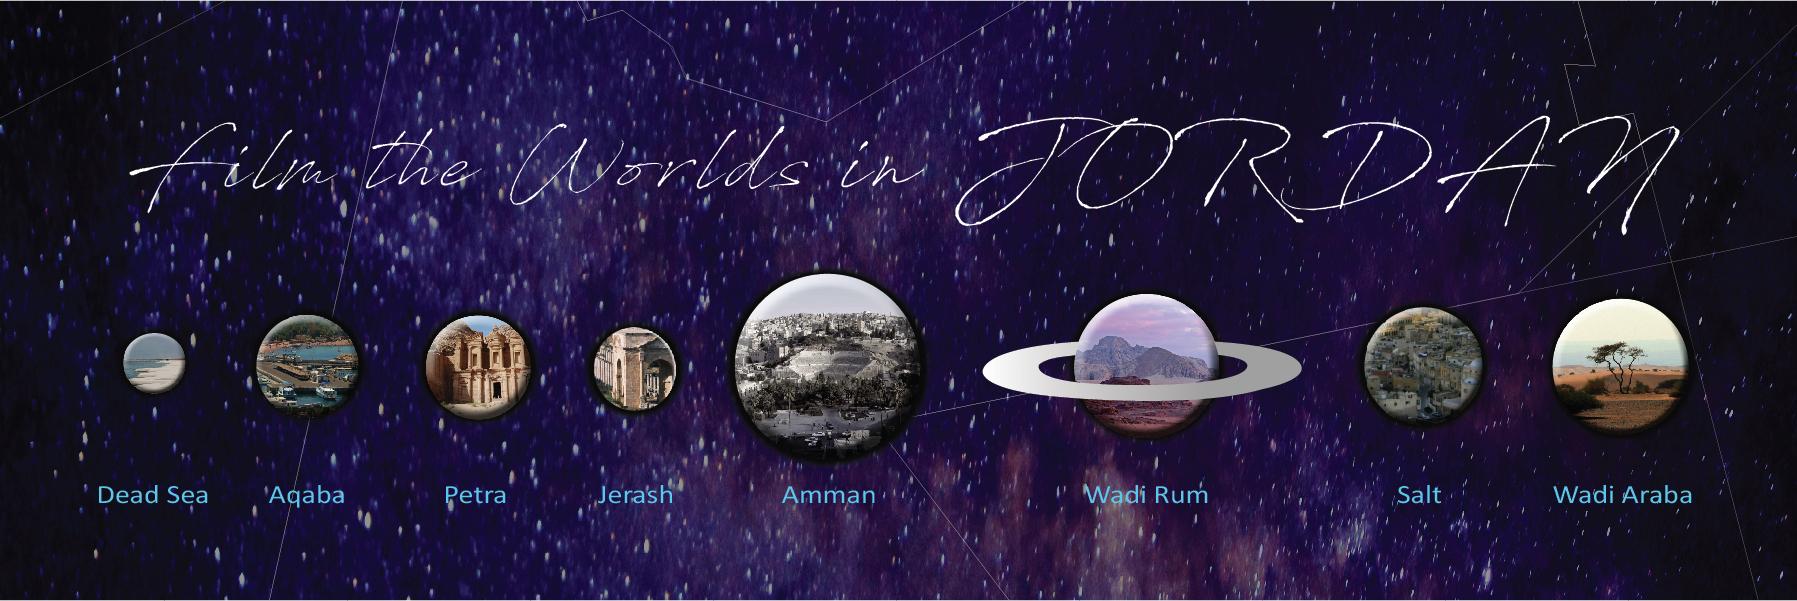 Royal Film Commission Jordan